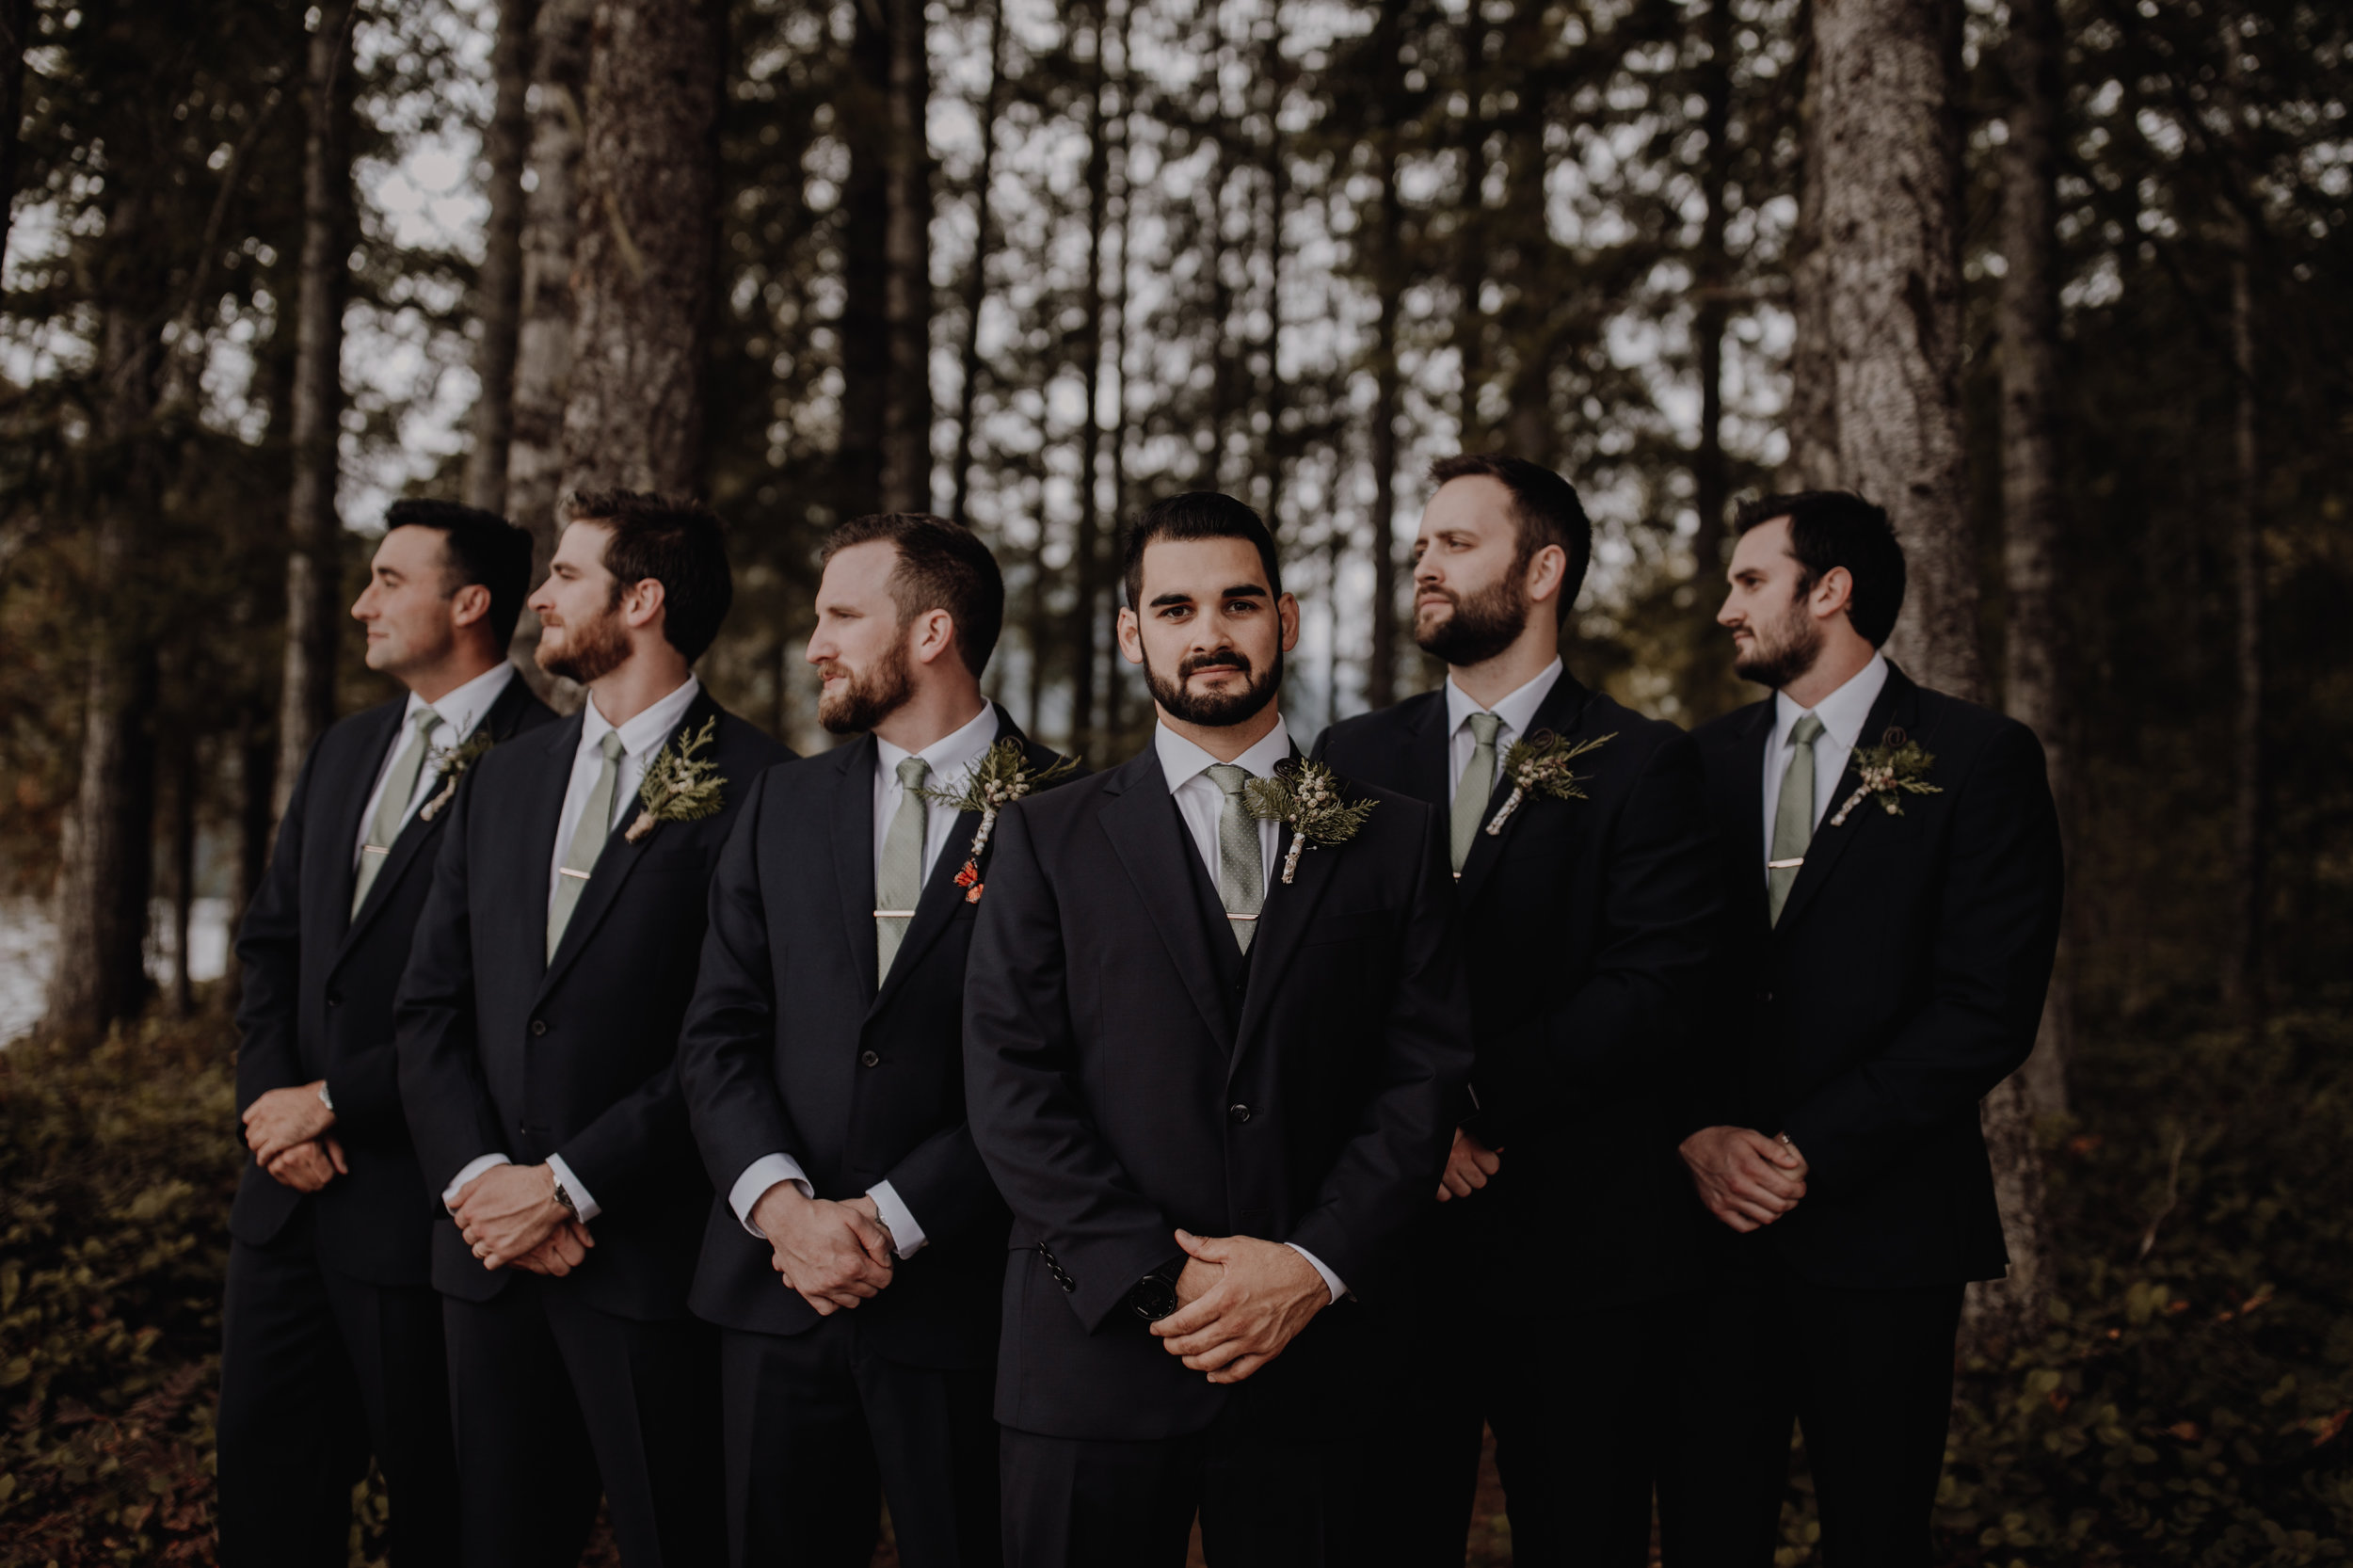 chelsea_jordan_wedding-192.jpg